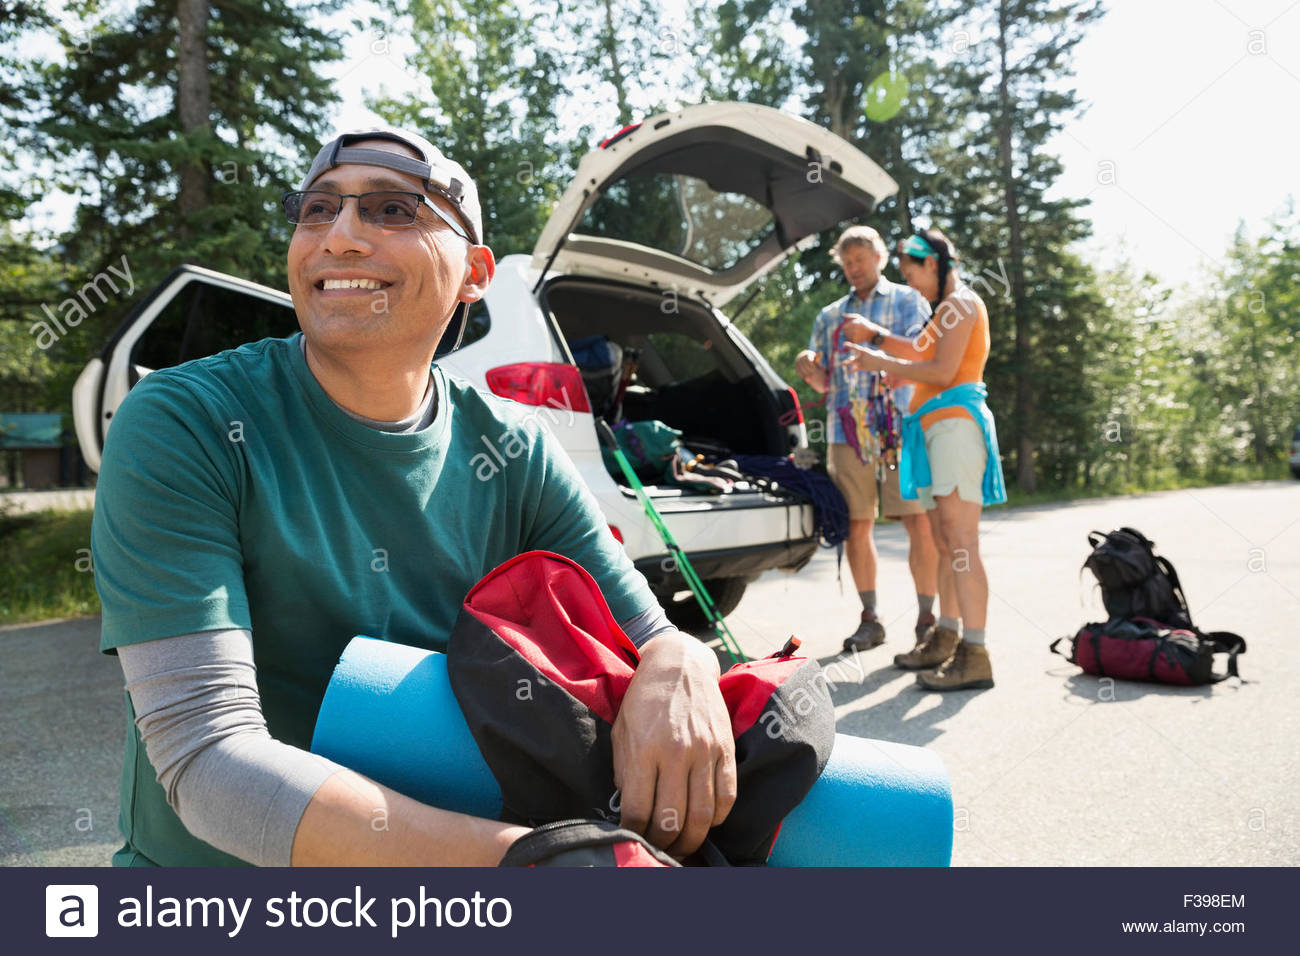 Smiling backpacker near car - Stock Image